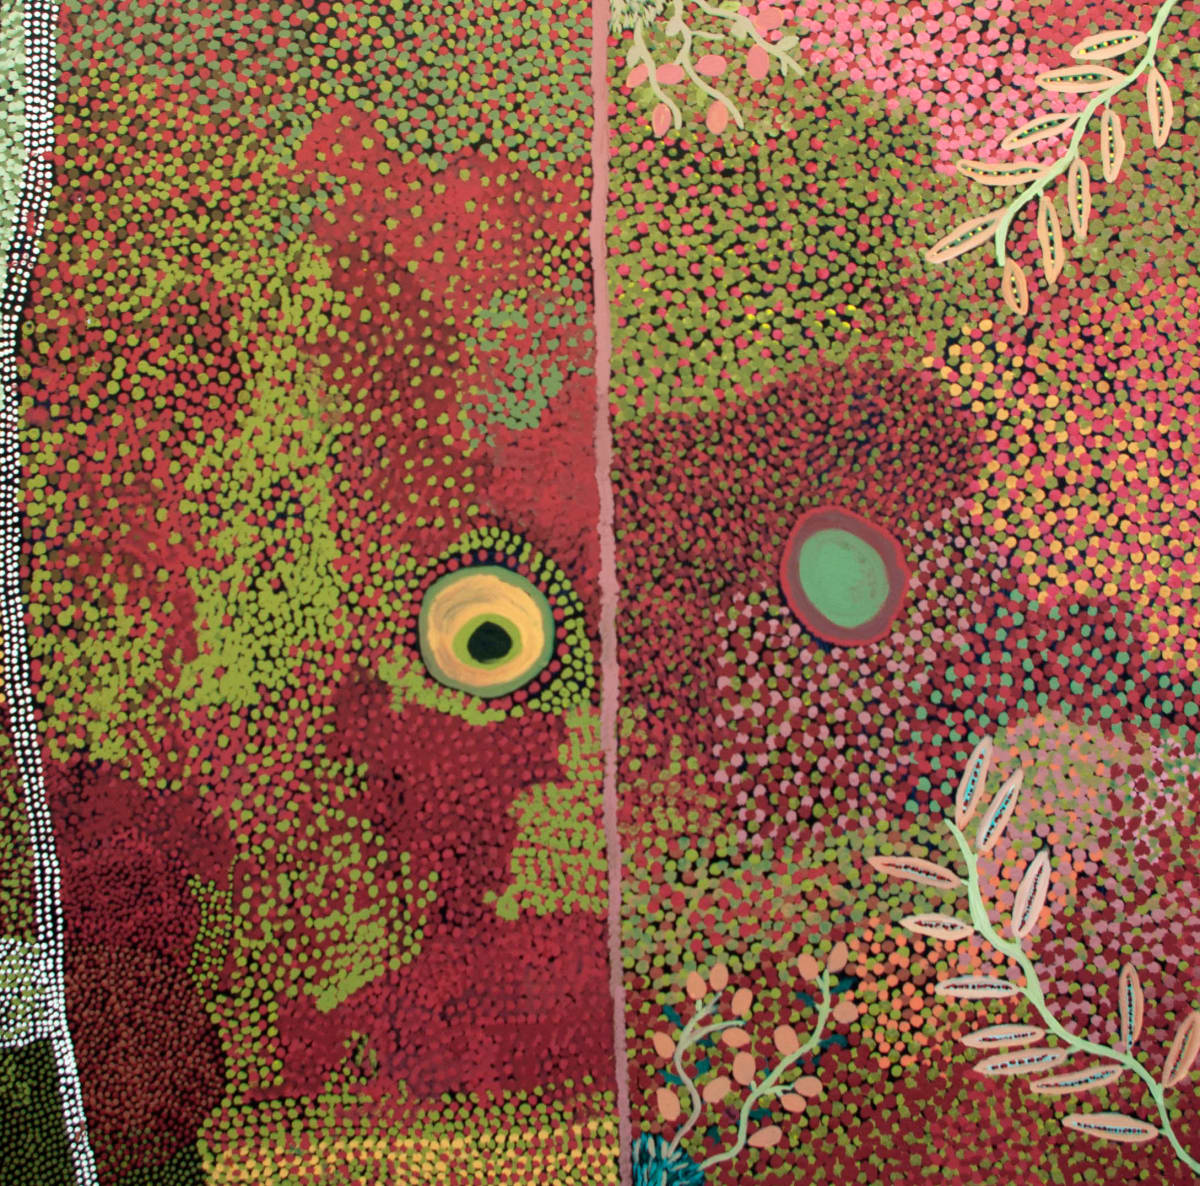 Nora Tjookootja Piparr Rockhole acrylic on canvas 120 x 120 cm